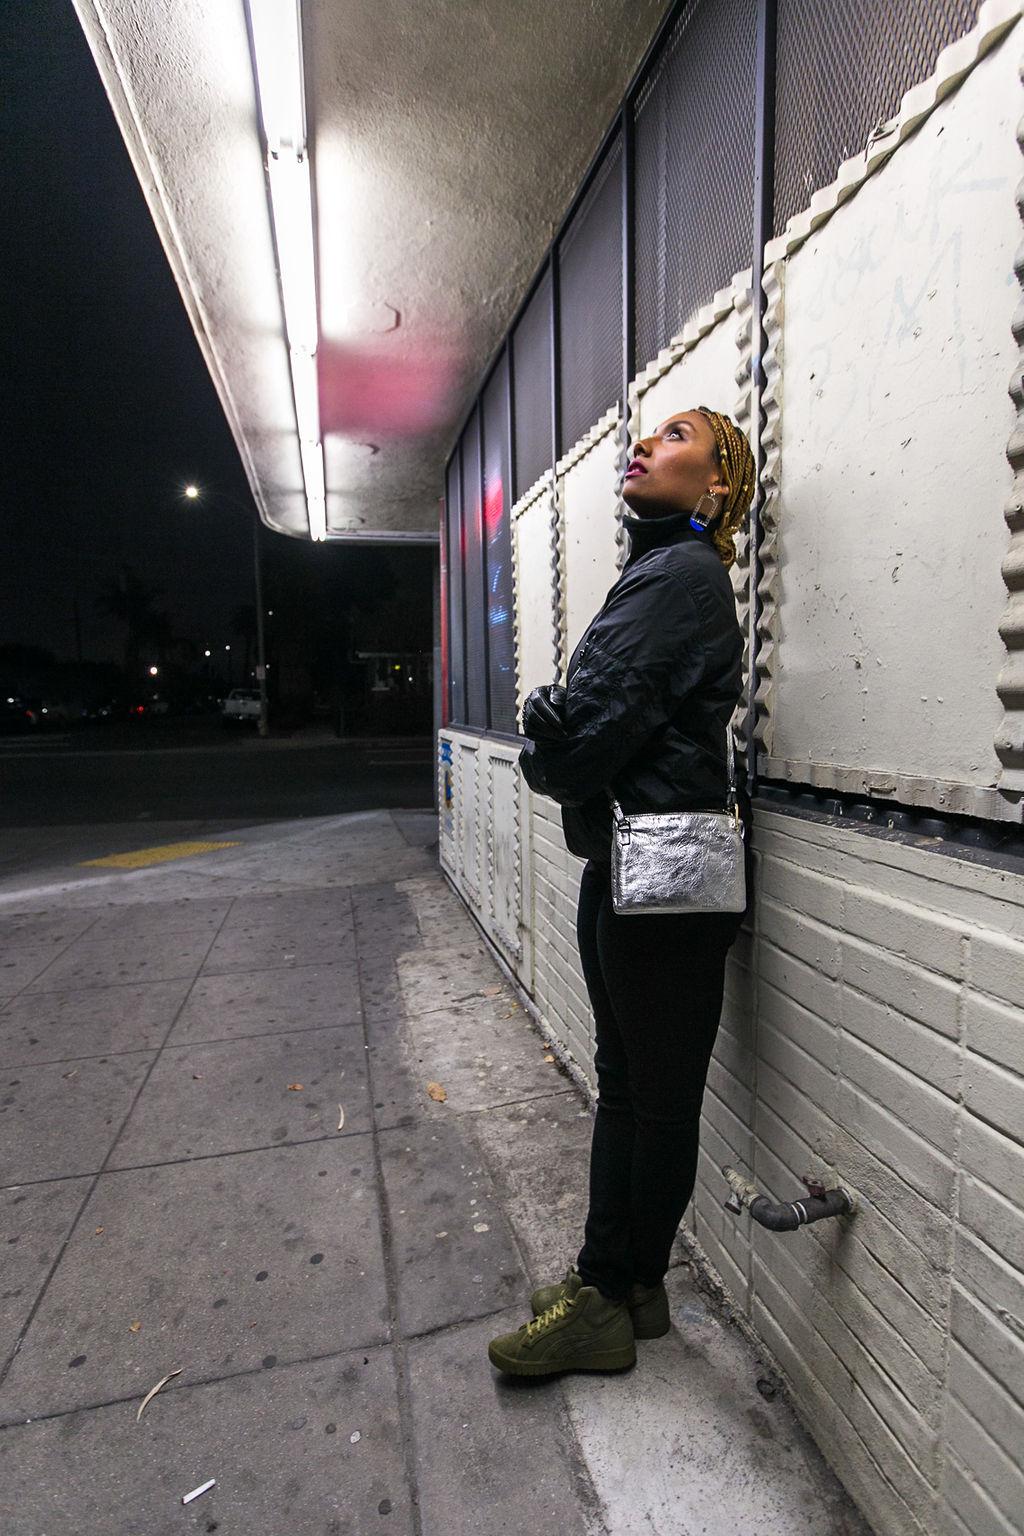 silver purse-black turtleneck-rsee-xmmtt-night photography-liquor store